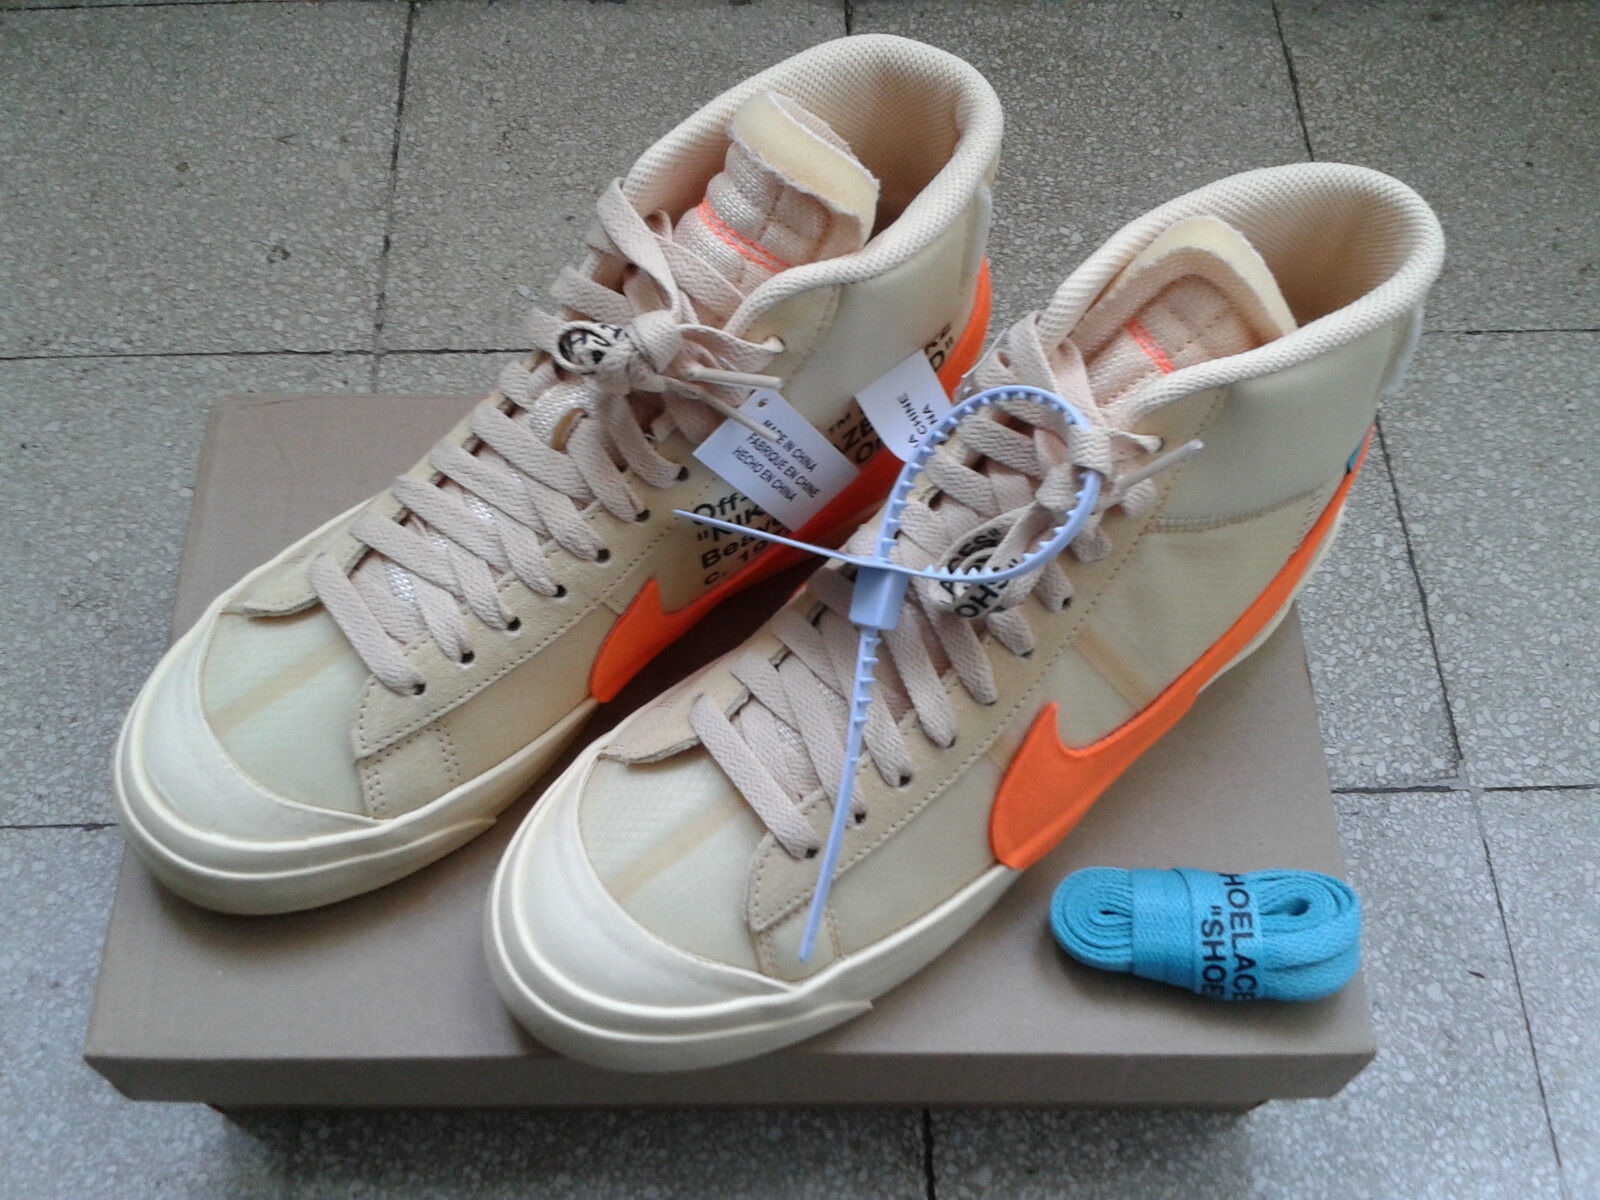 Nike Off White Blazer vanilla orange US 7.5 EU 40.5 AA3832-700 nuove originali